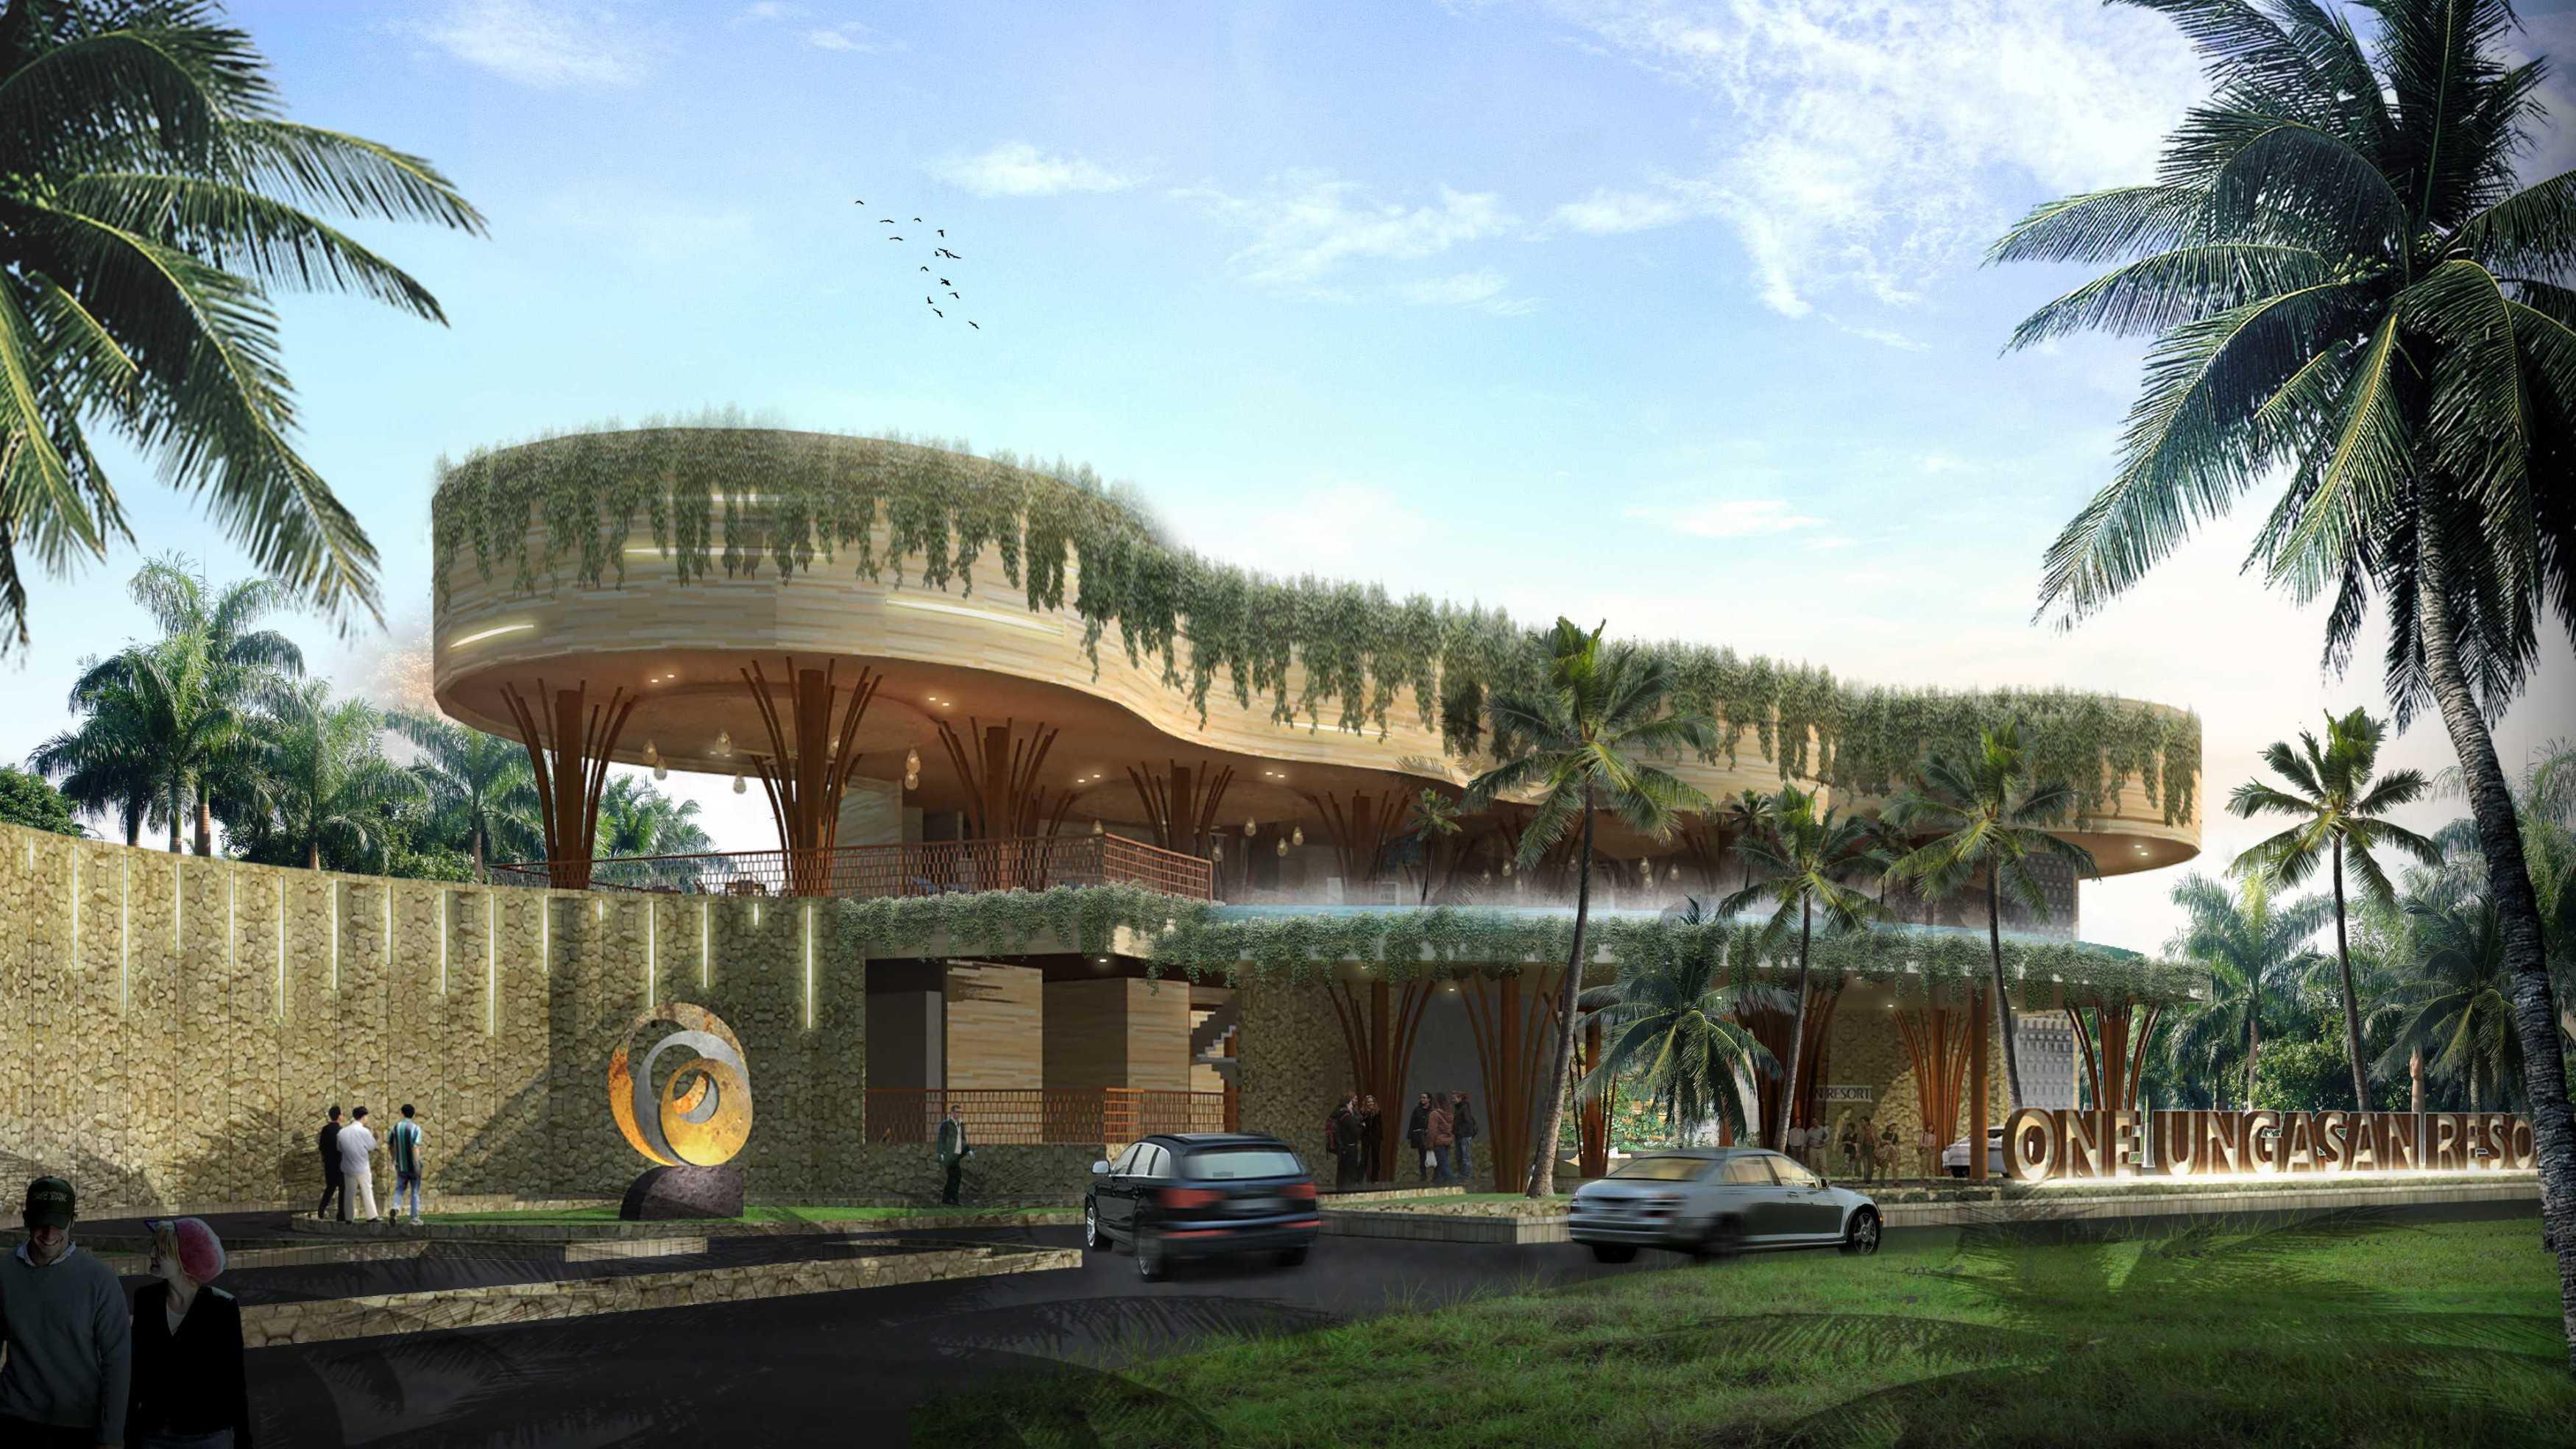 Alima Studio One Ungasan Resort Ungasan, Kuta Sel., Kabupaten Badung, Bali, Indonesia Ungasan, Kuta Sel., Kabupaten Badung, Bali, Indonesia Alima-Studio-One-Ungasan-Resort   57476